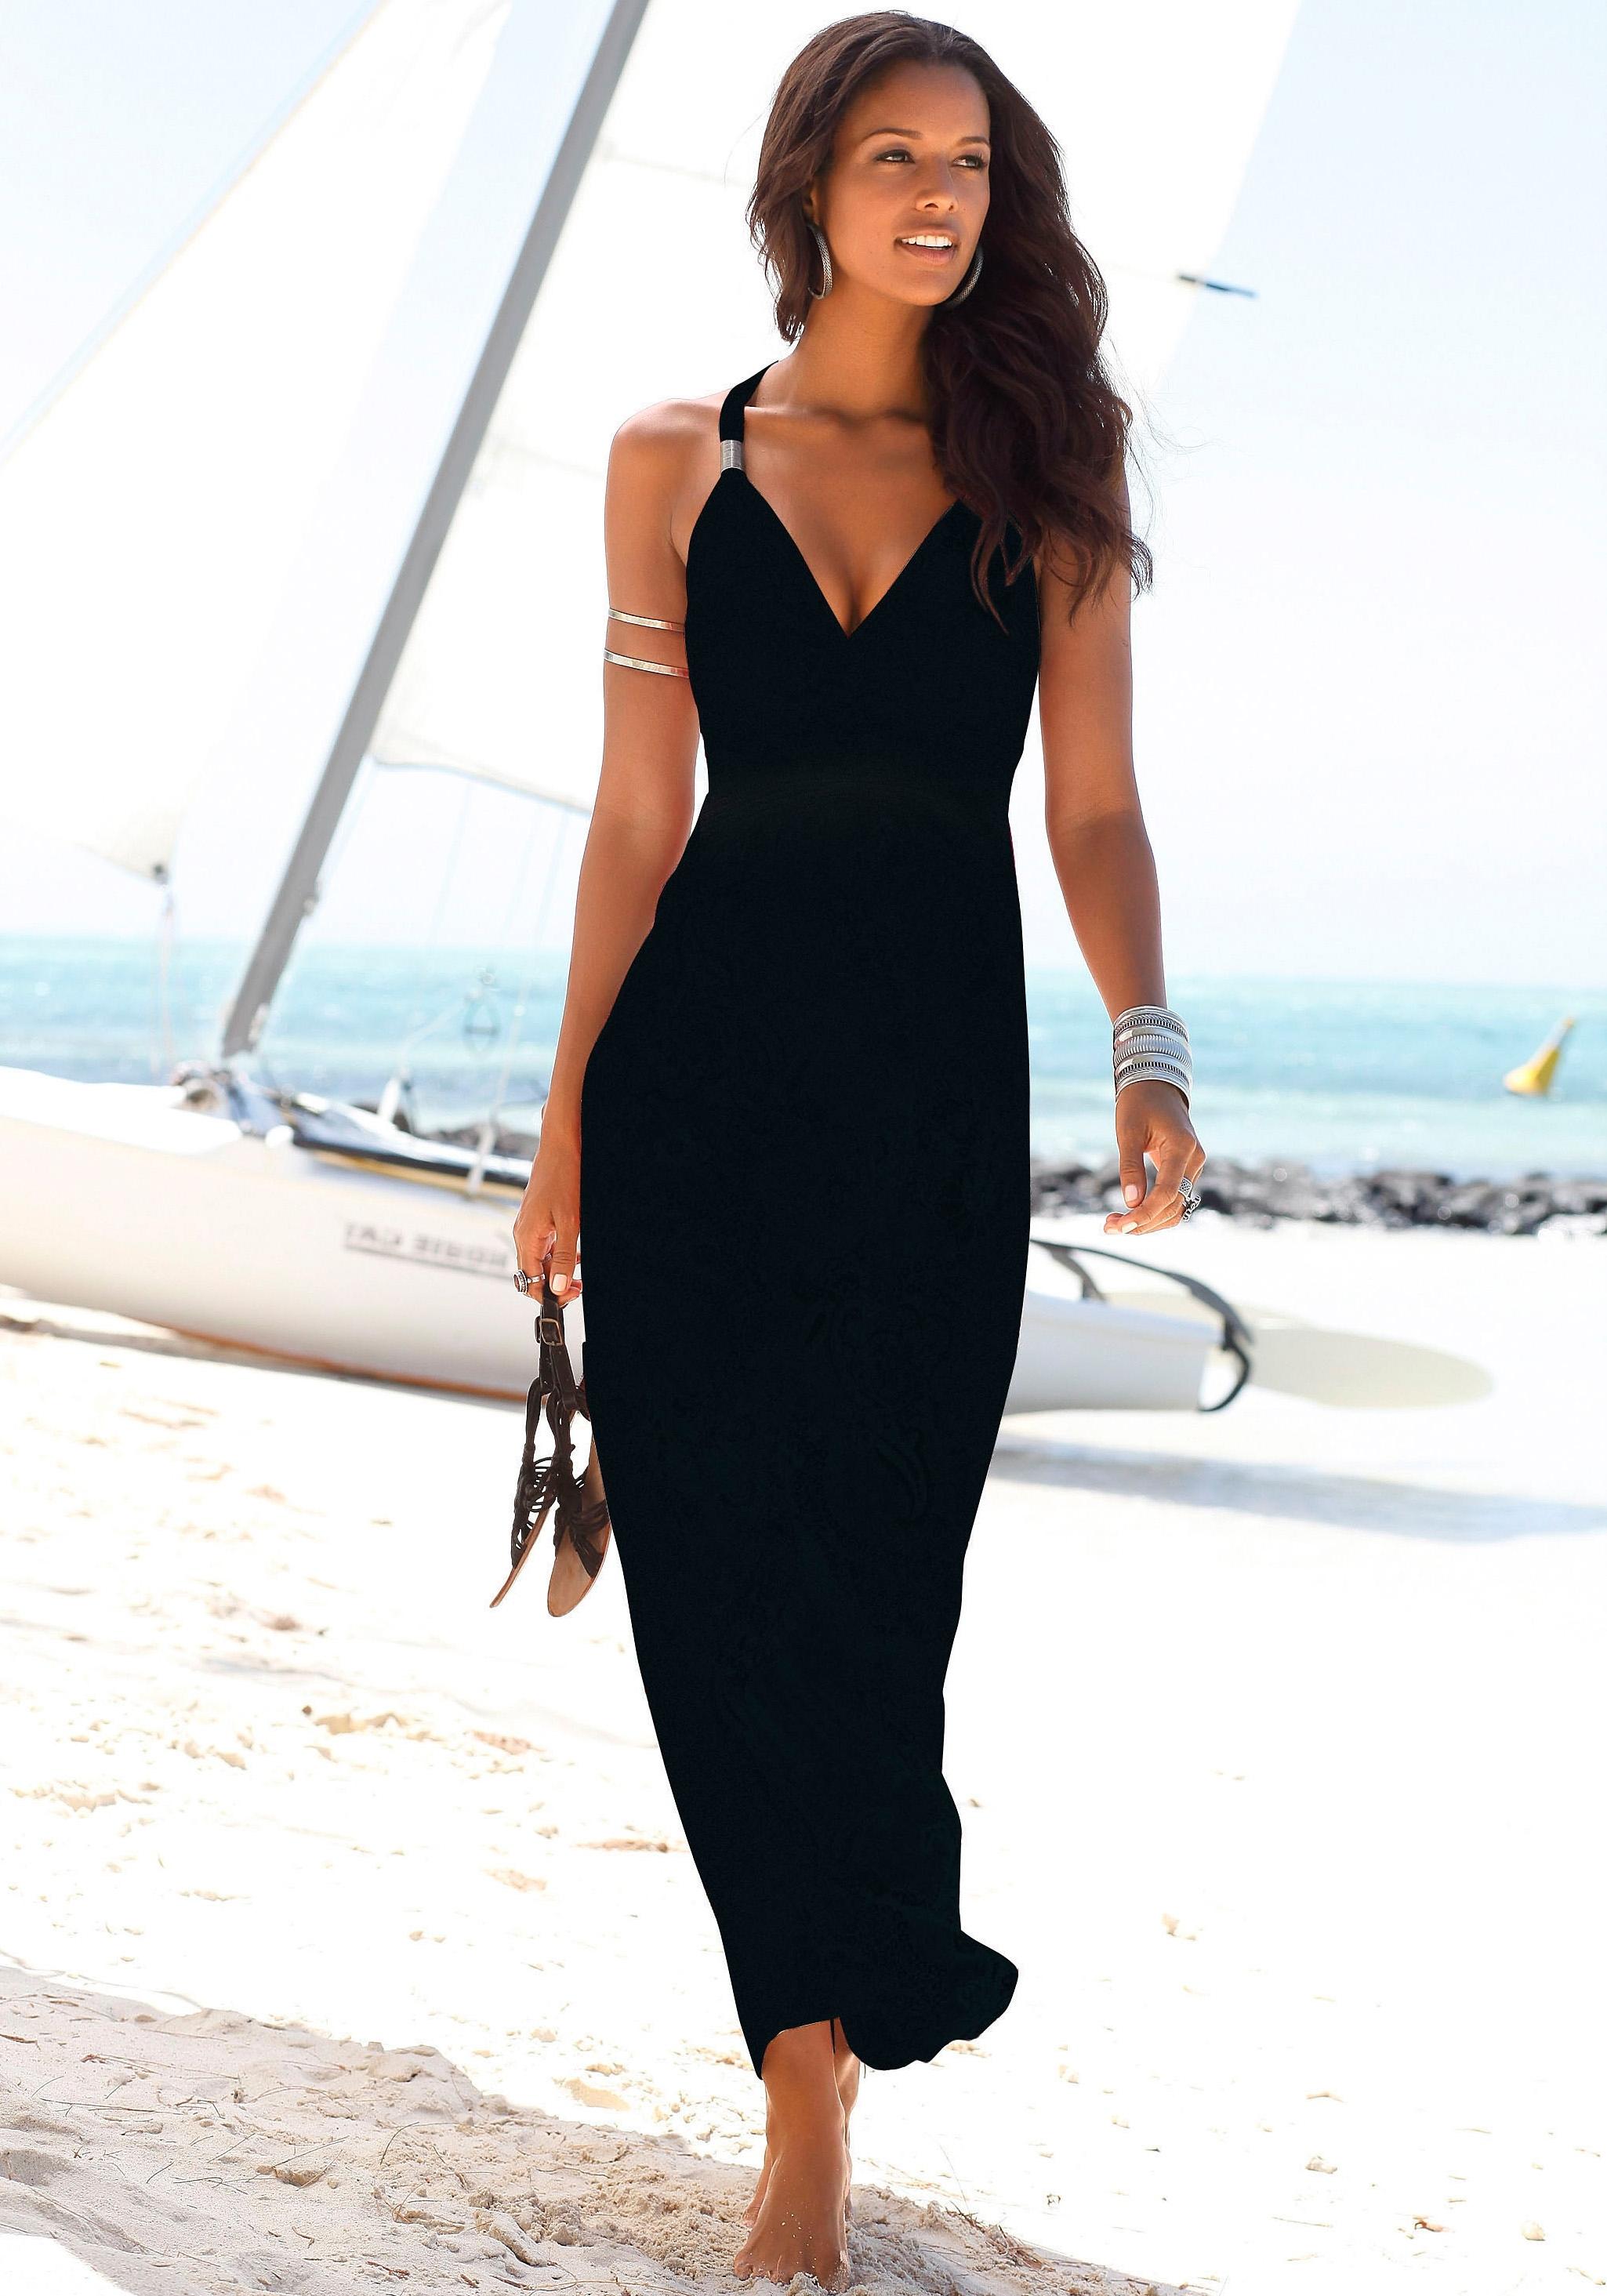 Lascana Maxi-jurk met verstelbare hals online kopen op lascana.nl